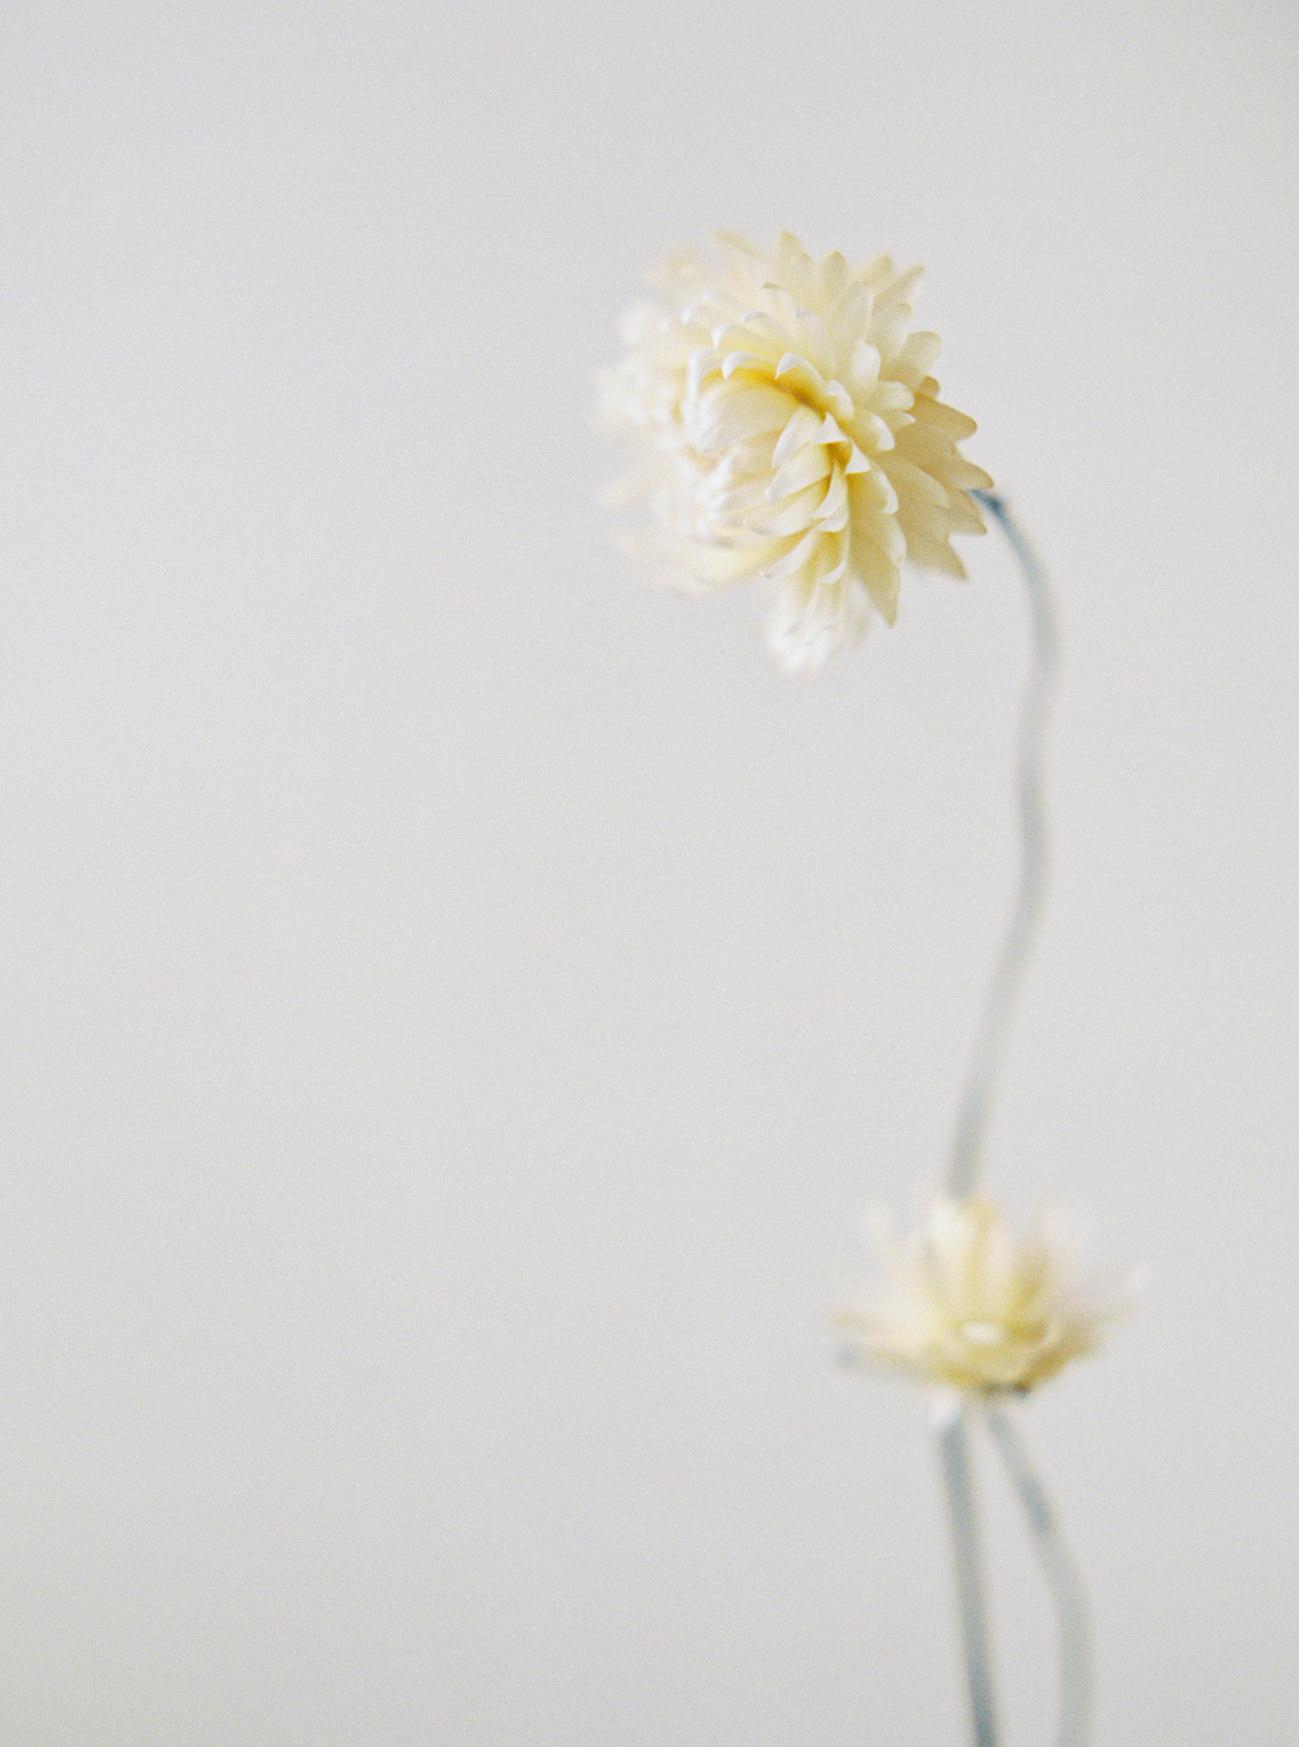 Bridal Inspiration, Wedding Bouquet, Hääkuvaus, Film Wedding Photographer, Table Setting Inspiration, Stationery, Dried Flowers, www.nordandmae.com, www.susannanordvall (30).jpg